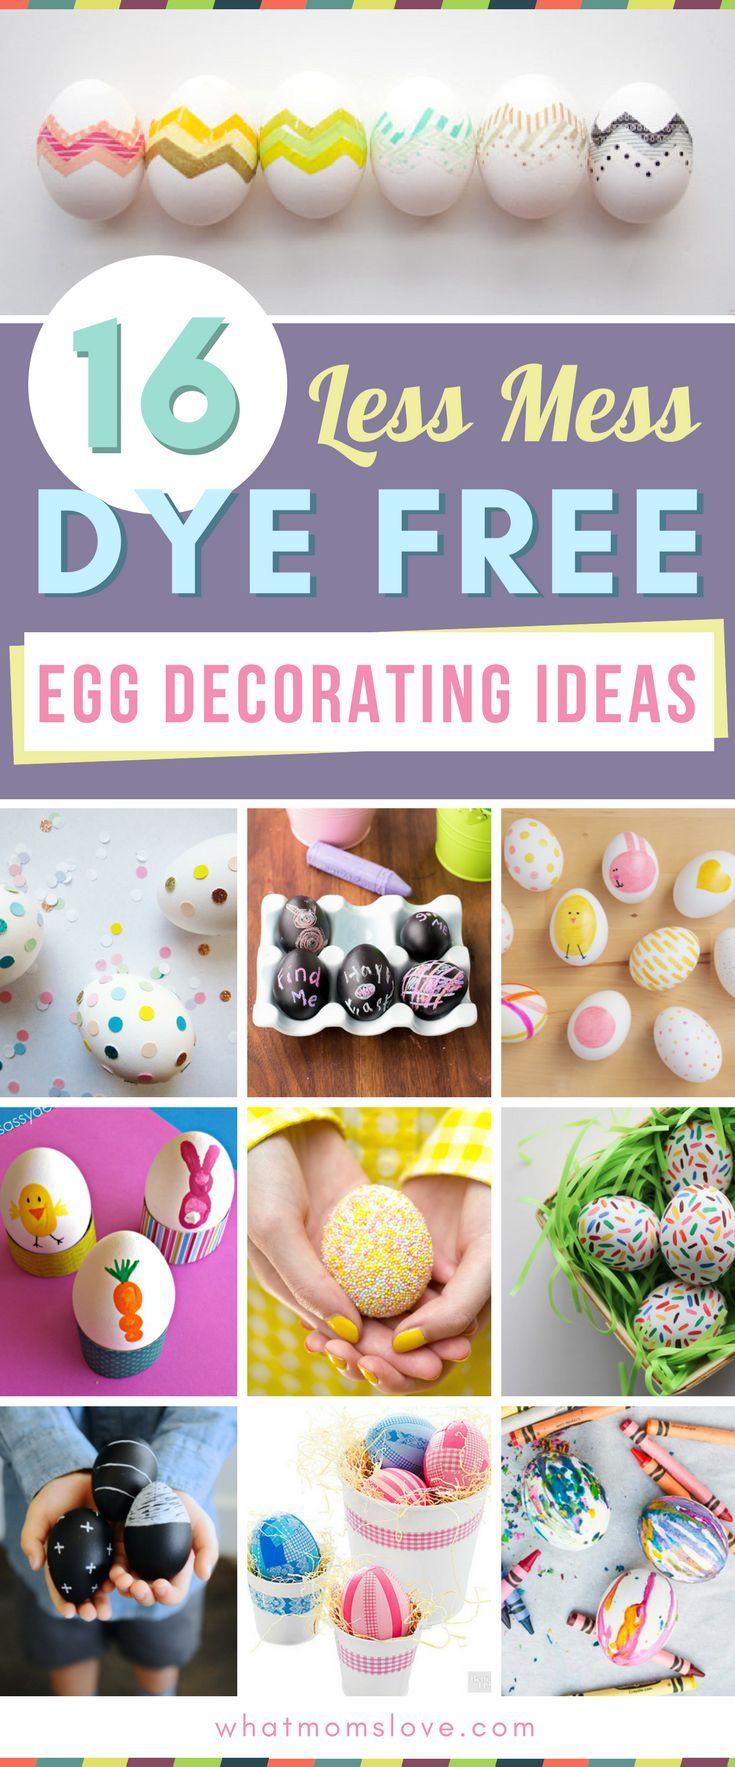 Easter Egg Decorating Ideas For Kids 70 Creative Ways To Decorate Your Eggs Egg Decorating Easter Fun Easter Eggs